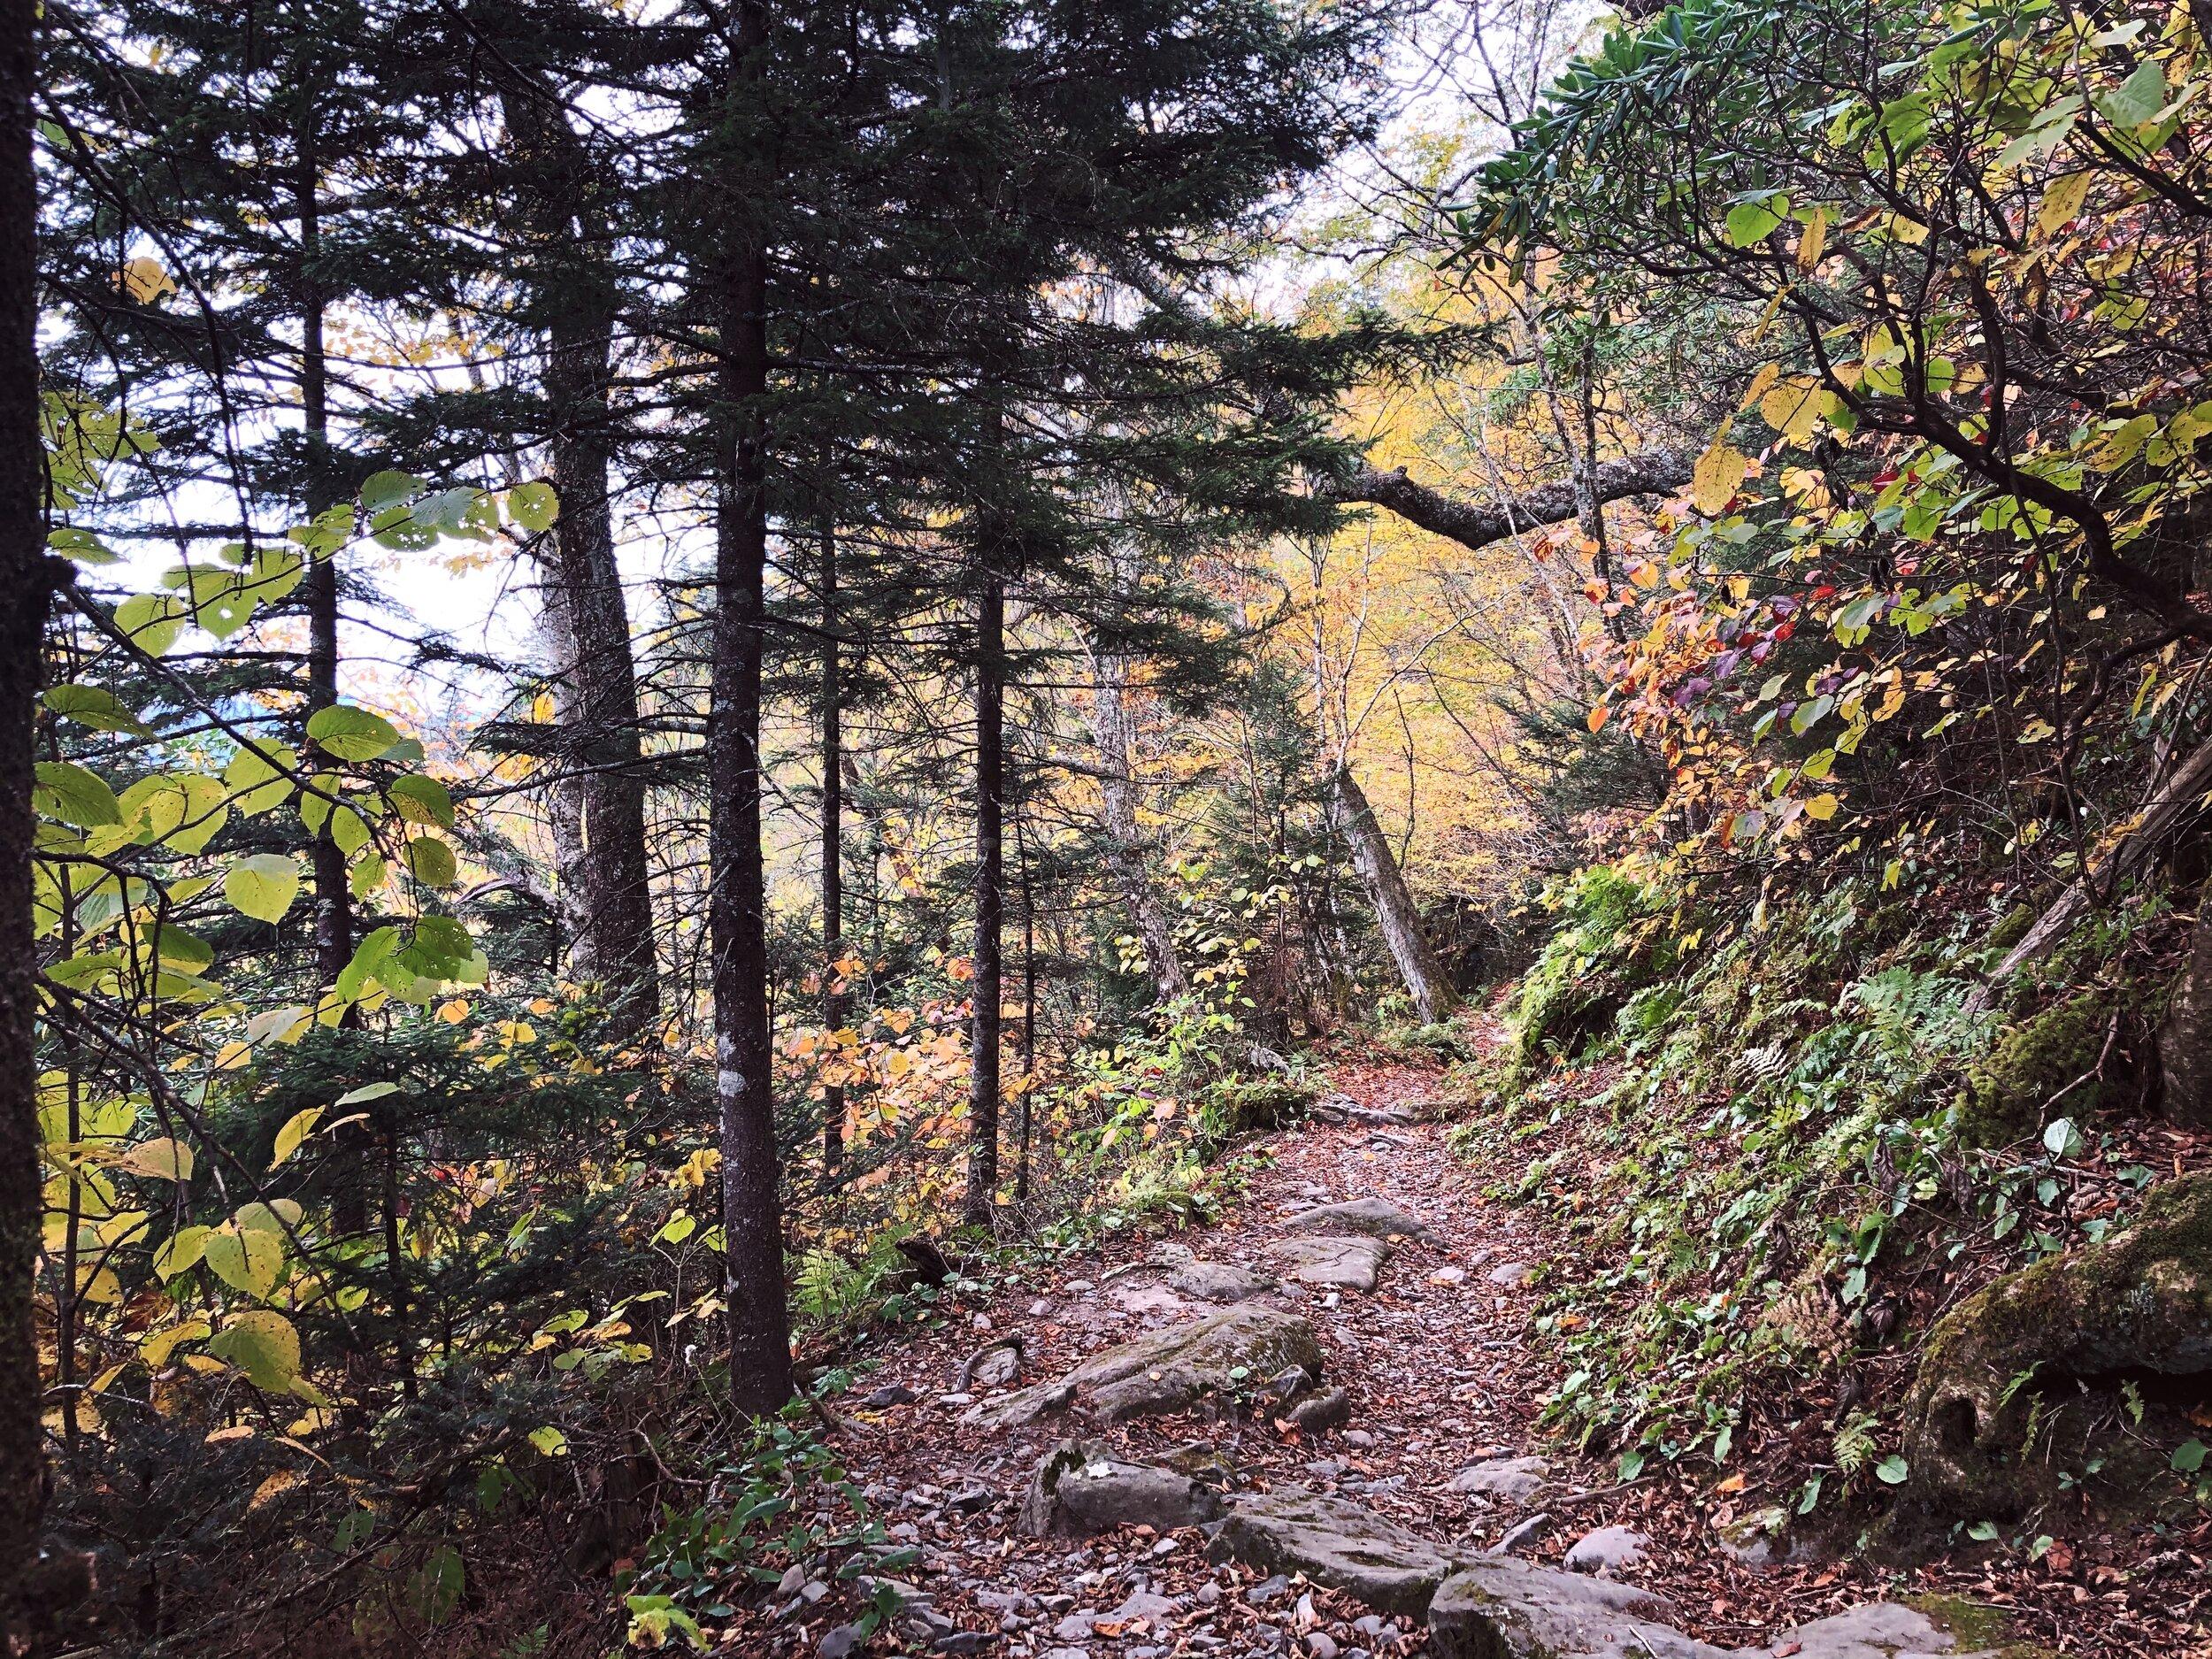 mount-leconte-rainbow falls trail-great-smoky-mountains-gatlinberg-tennessee0447.JPG